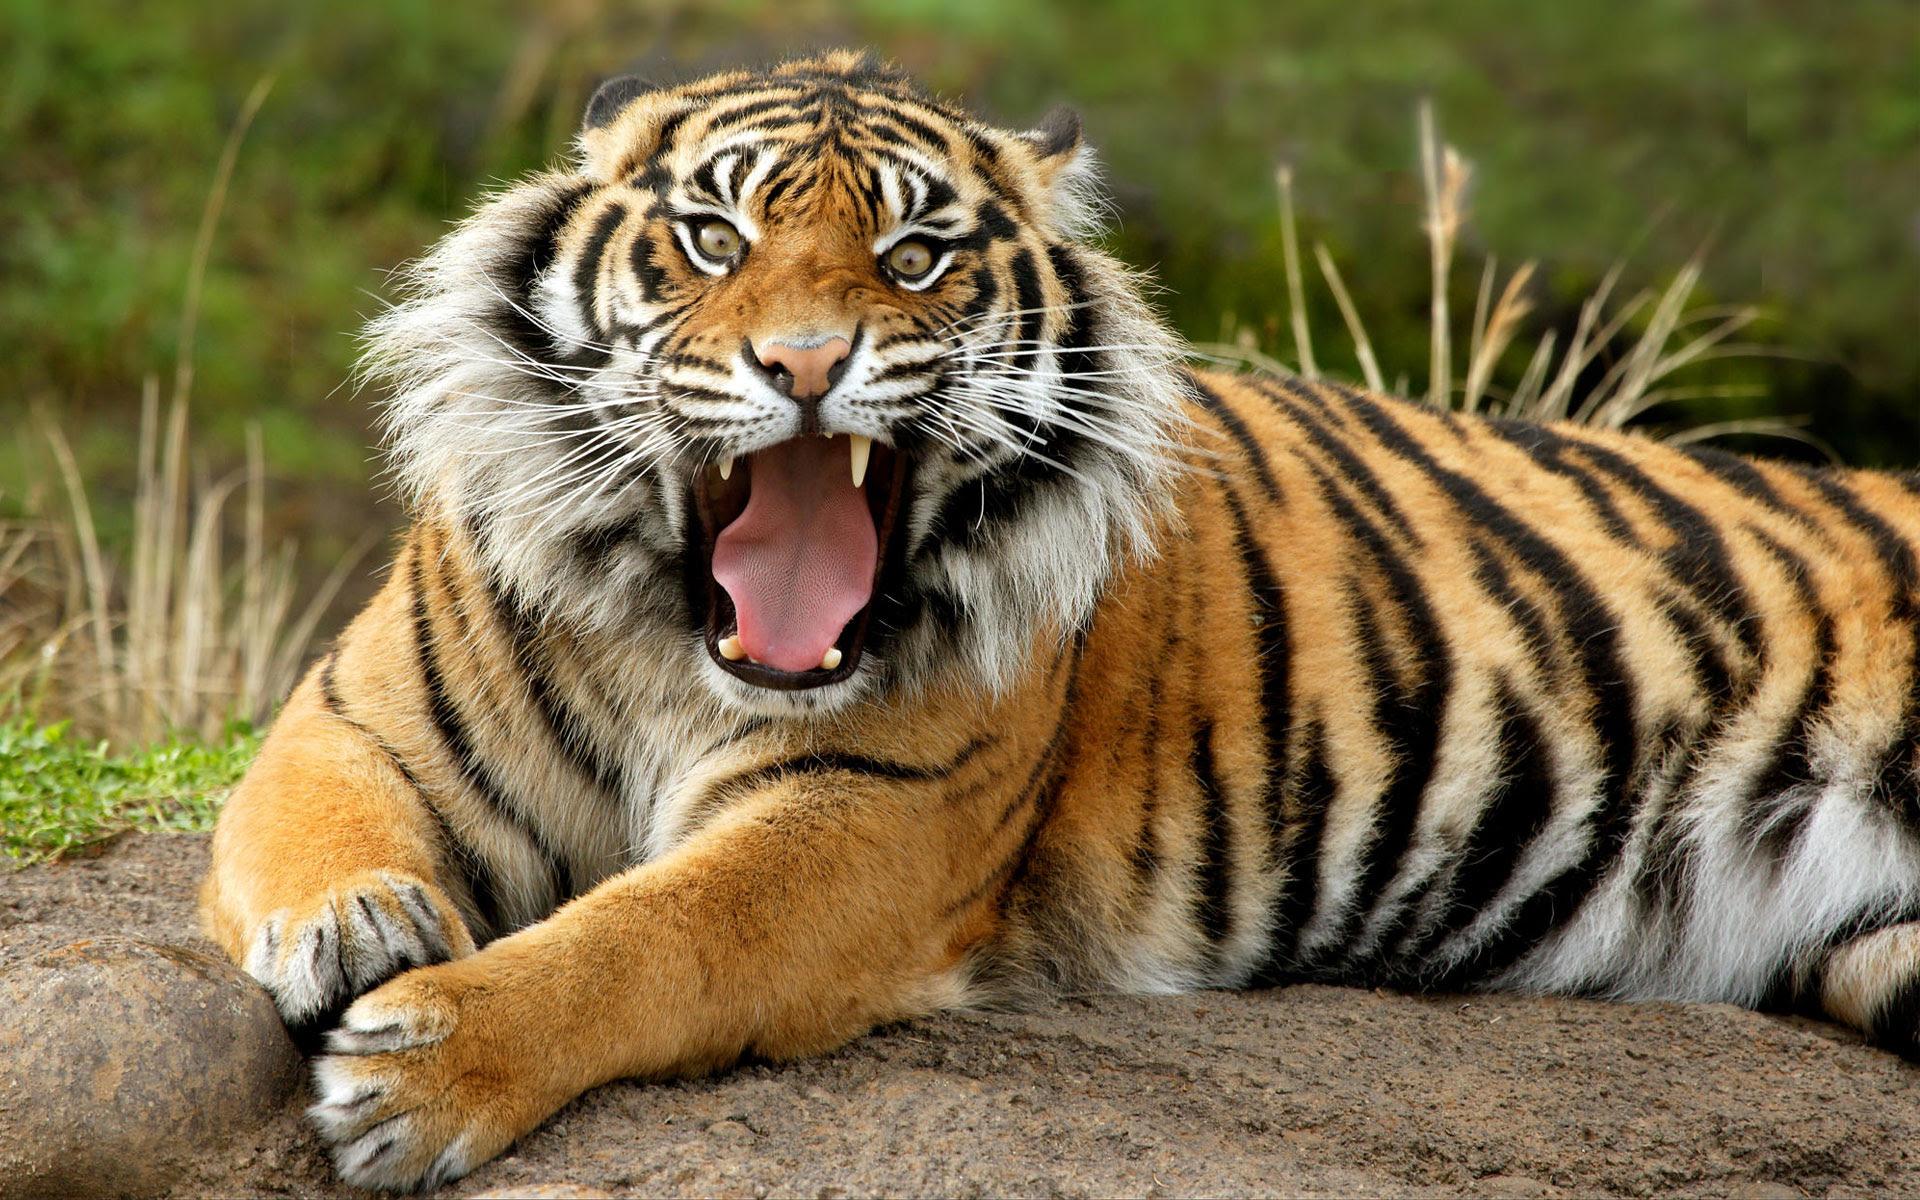 Sumatran Dangerous Tiger Wallpapers  HD Wallpapers  ID #5037